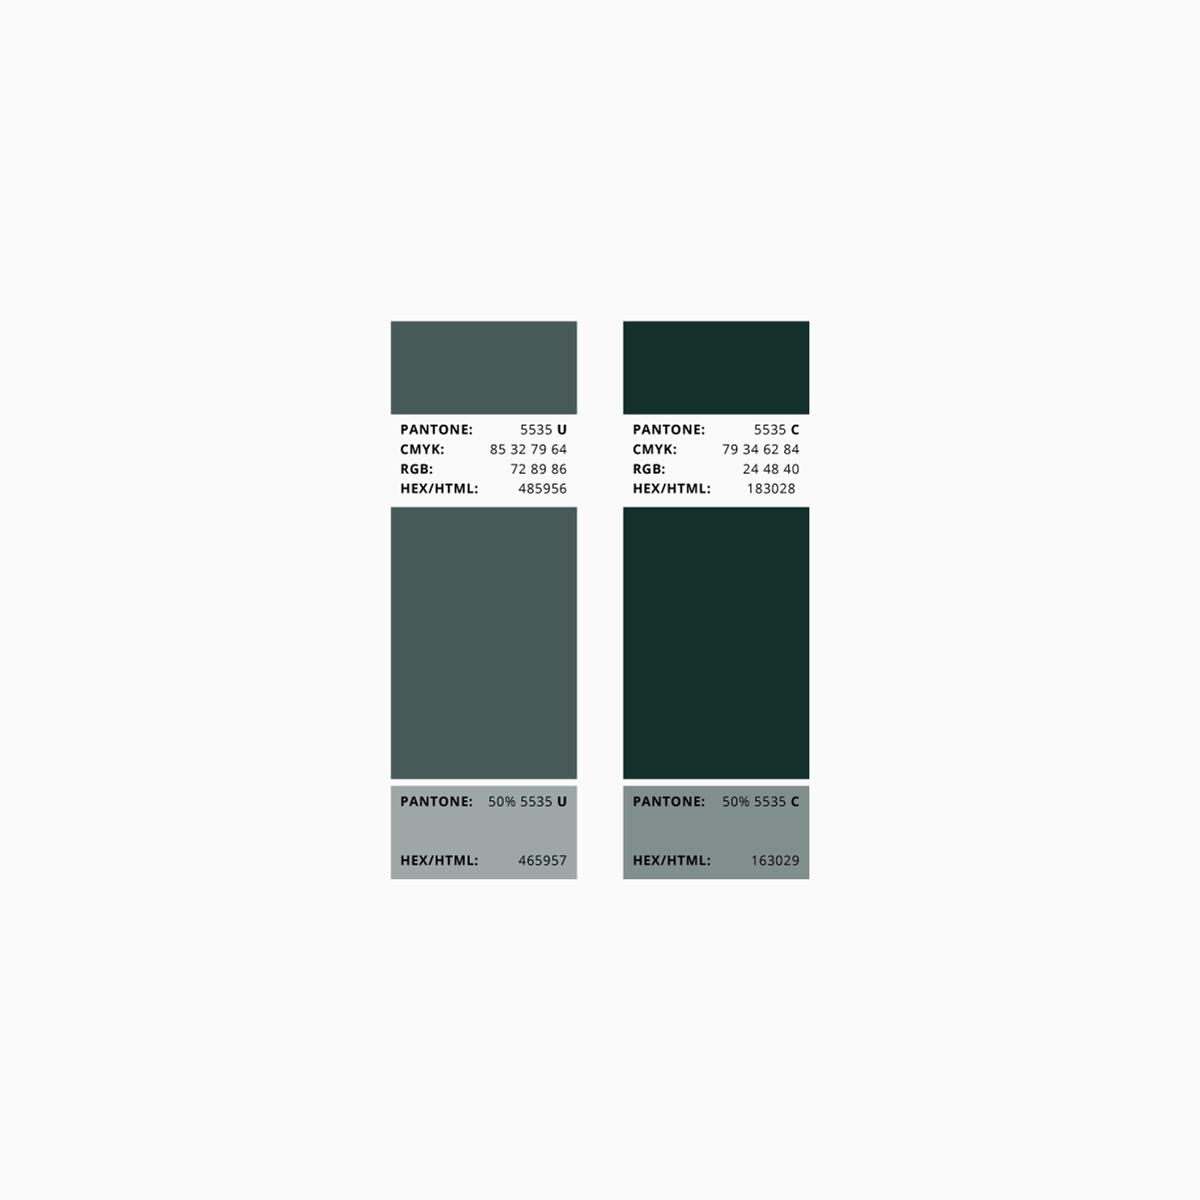 Weecare profil farver